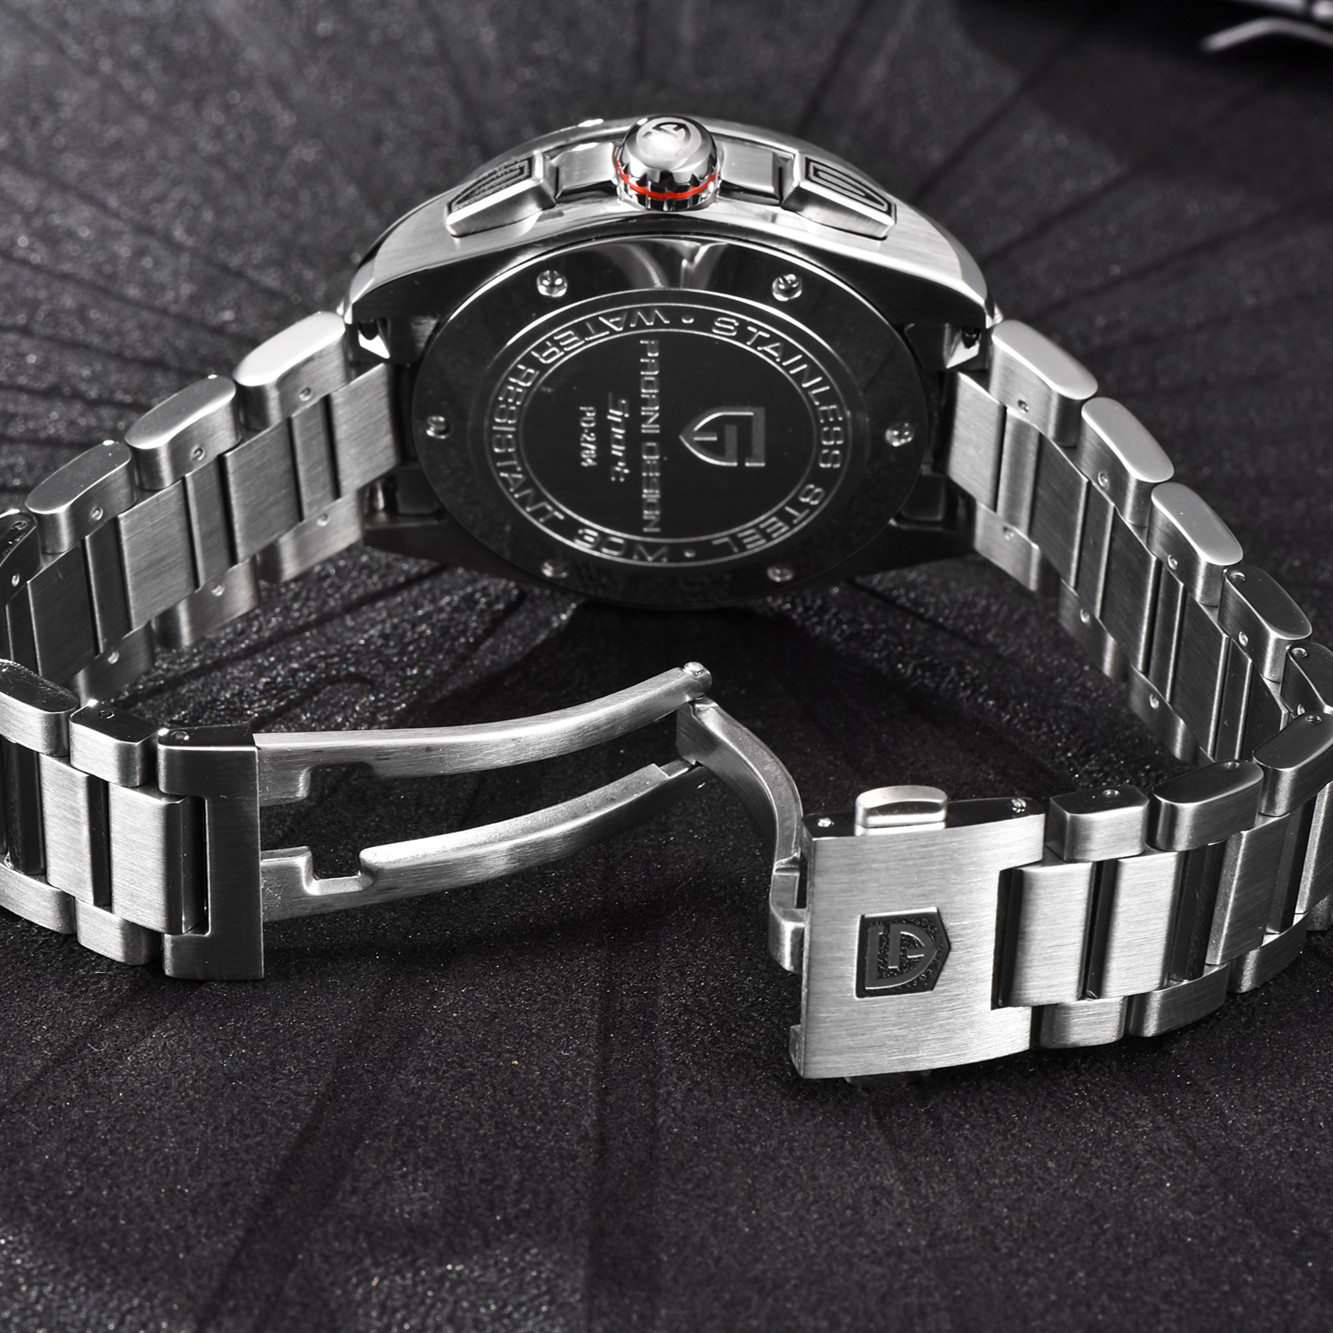 Relojes deportivos de marca de diseño PAGANI para hombre, cronógrafo militar, reloj militar de cuarzo, acero inoxidable, reloj militar para hombre, reloj Masculino, Saat - 4